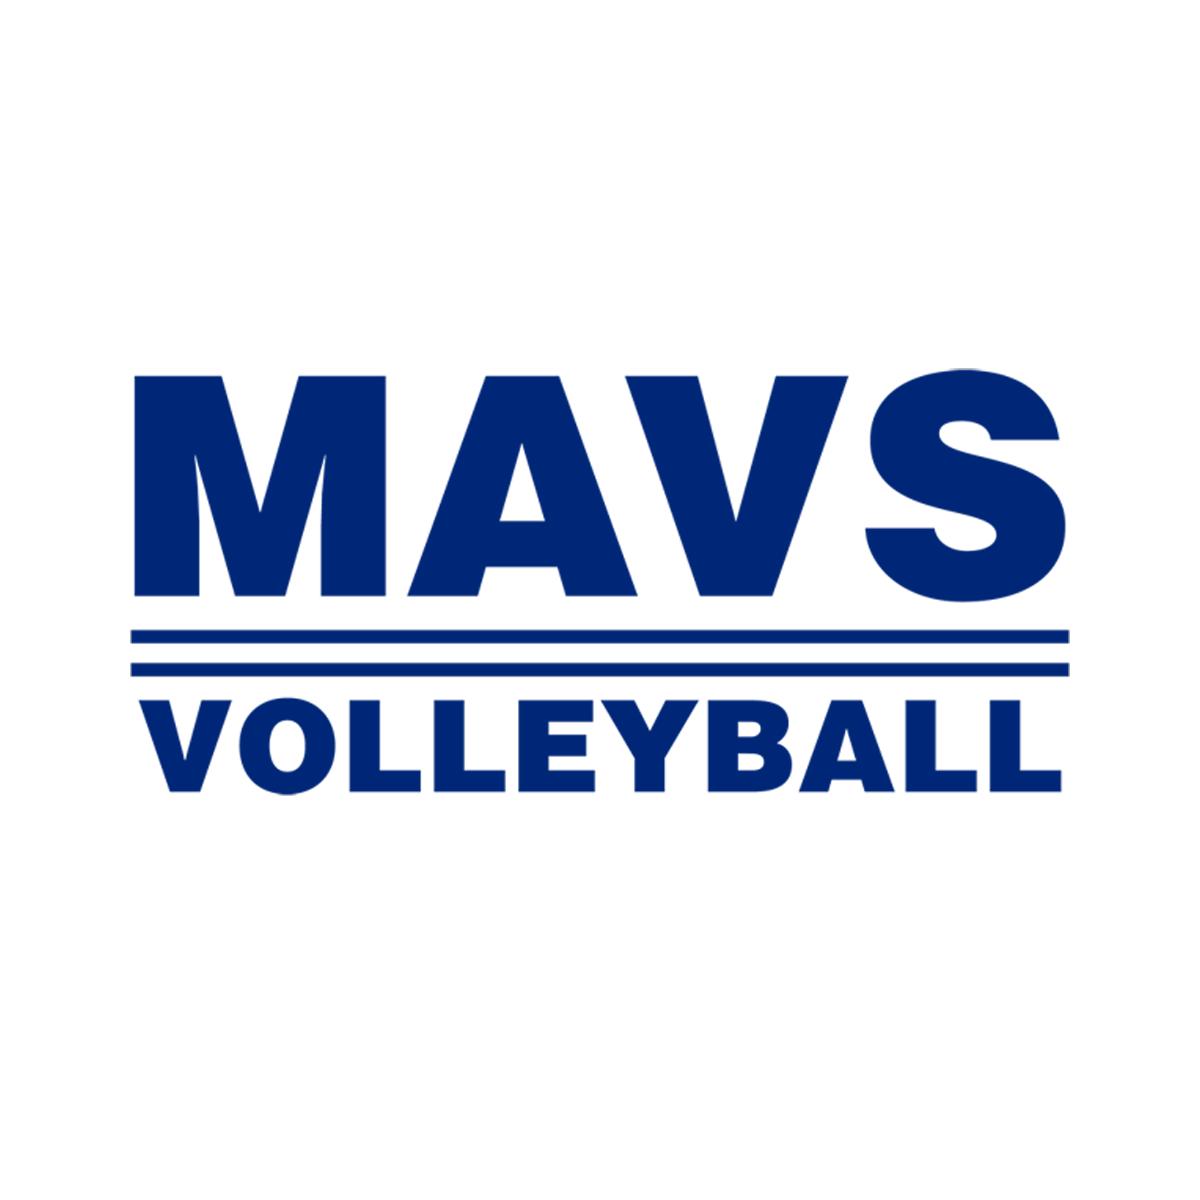 MAVS VOLLEYBALL (2x a week)